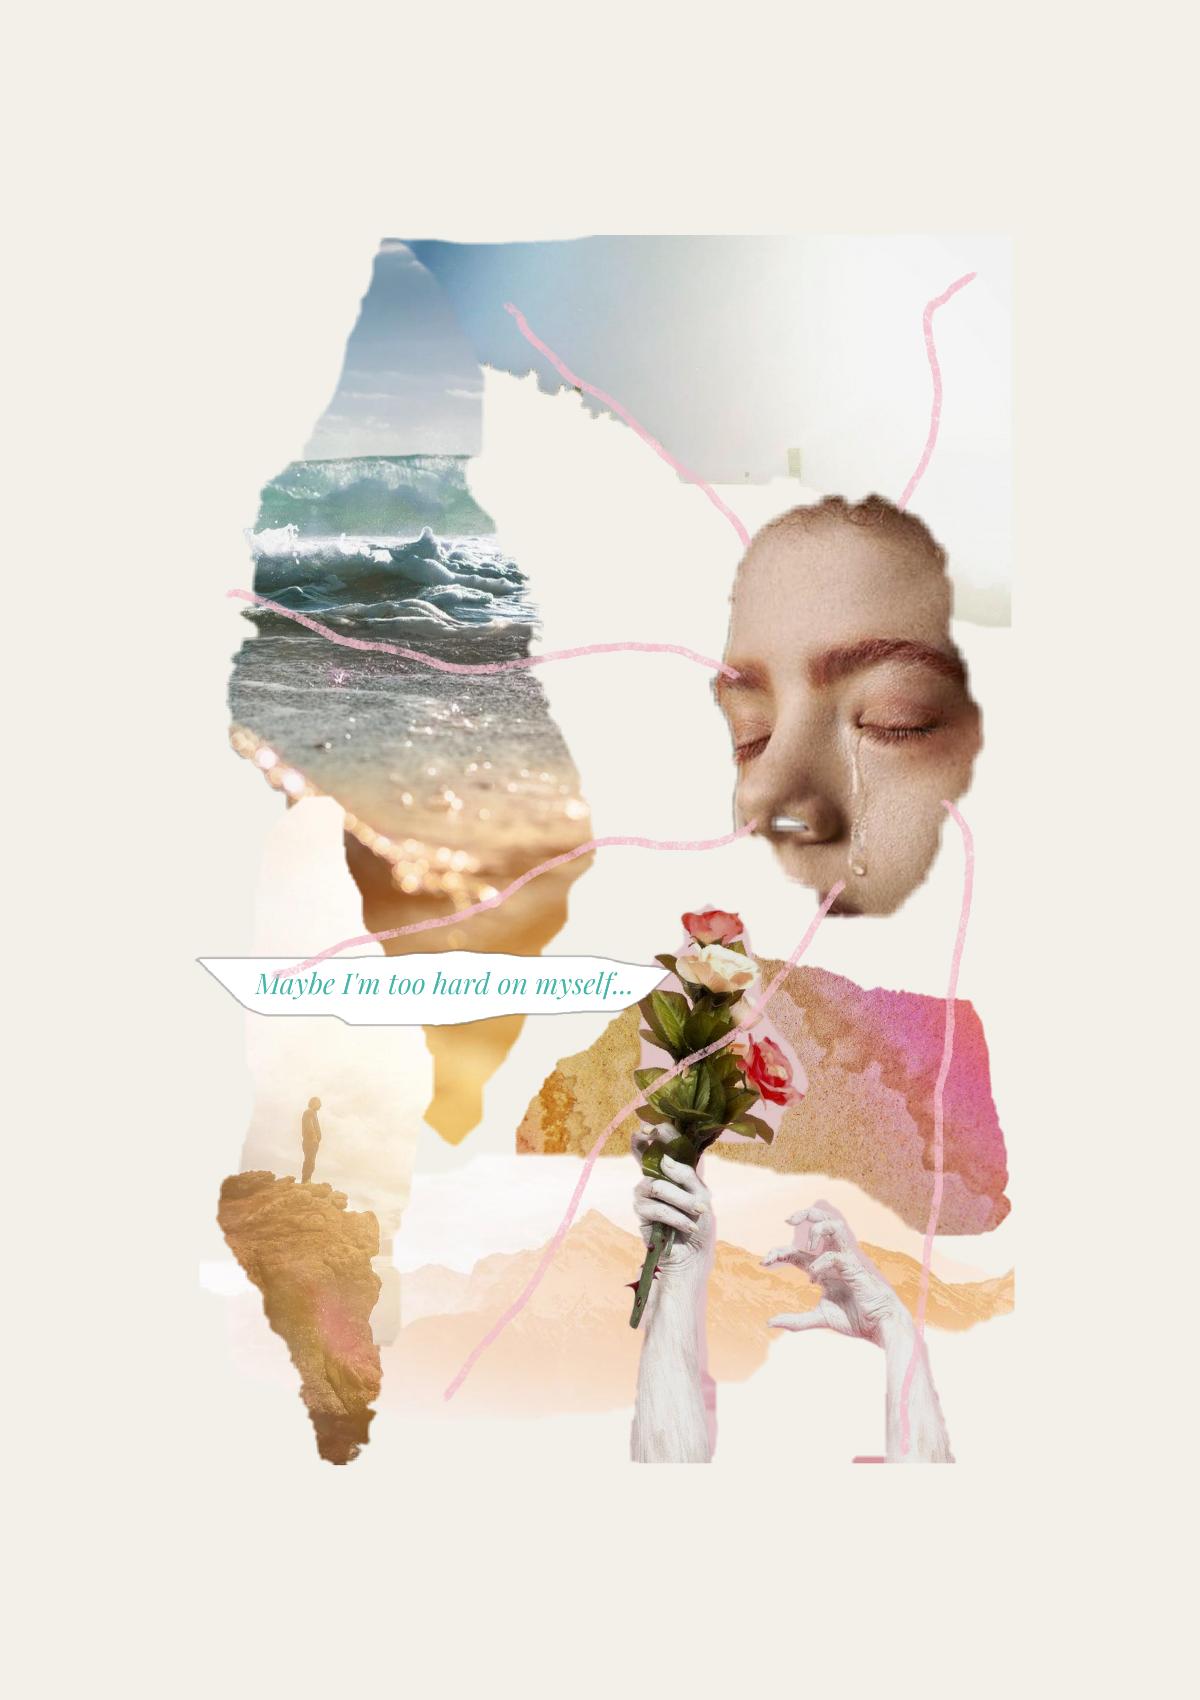 Keneilwe Mokoena, #7531, 2019  Digital Collage  148 x 210 mm  Ed: 10  R 2100 (Unframed)